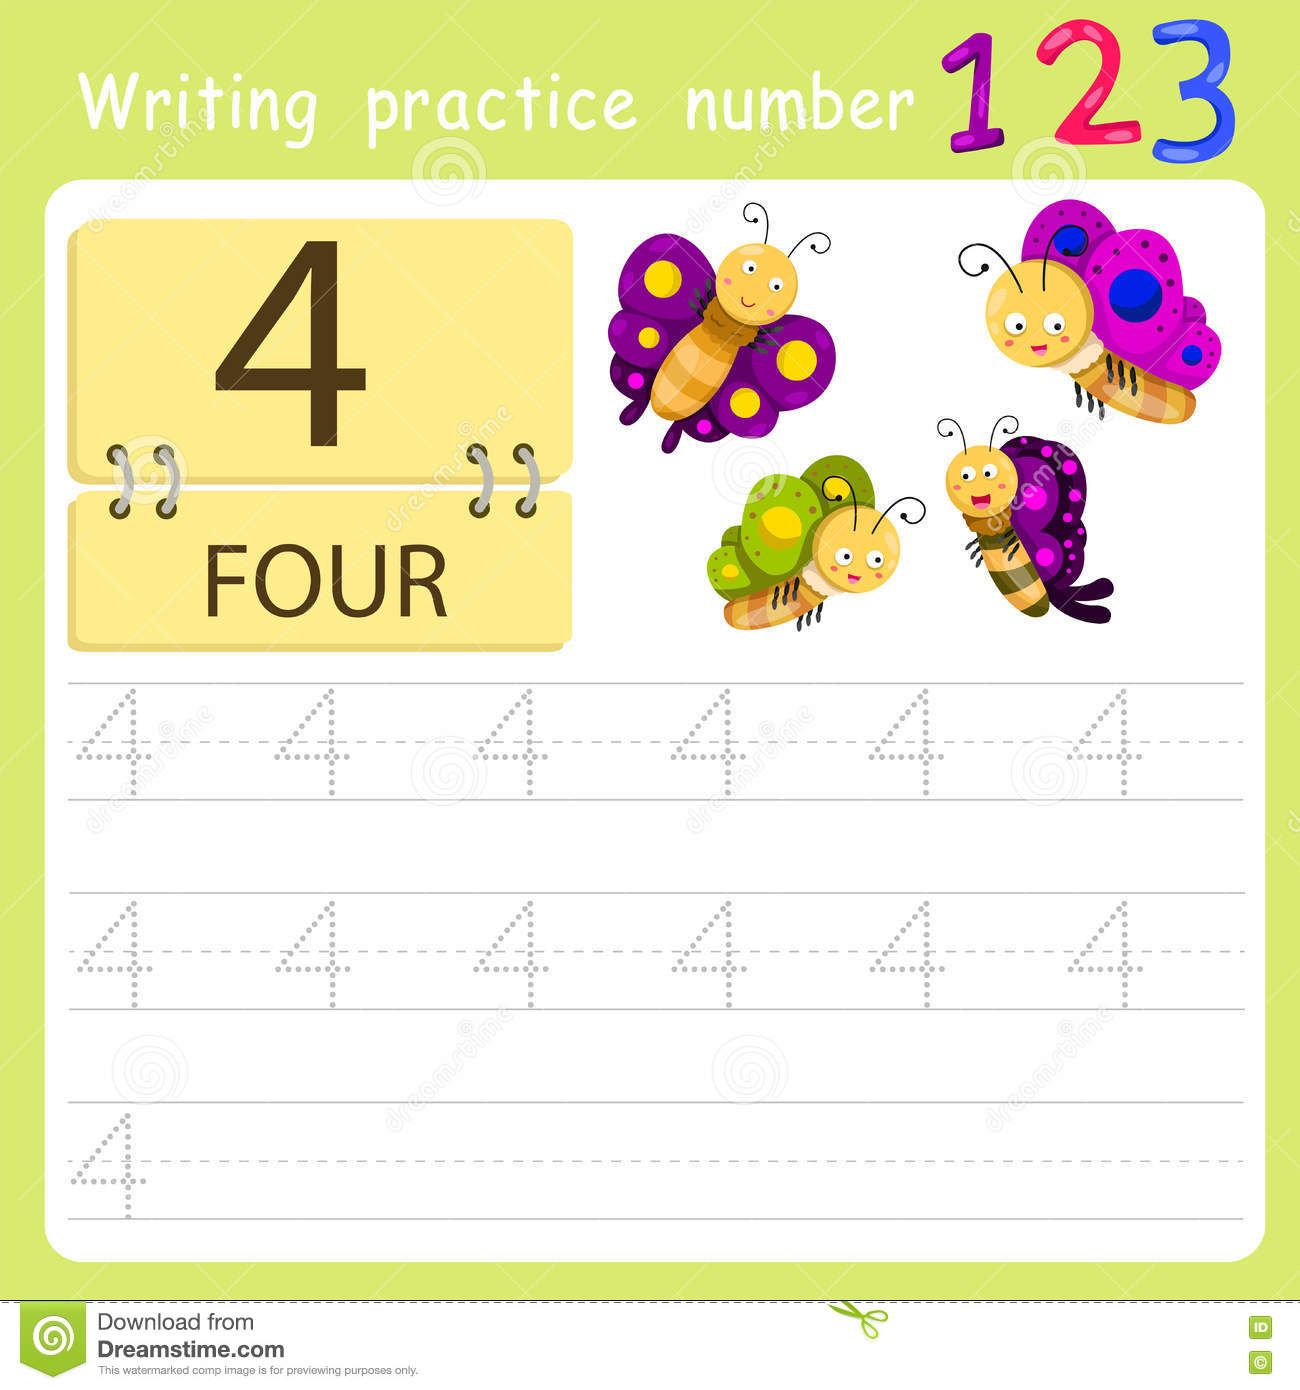 Worksheet Writing Practice Number Four Stock Vector Image 78960785 Writing Practice Writing Worksheets [ 1390 x 1300 Pixel ]